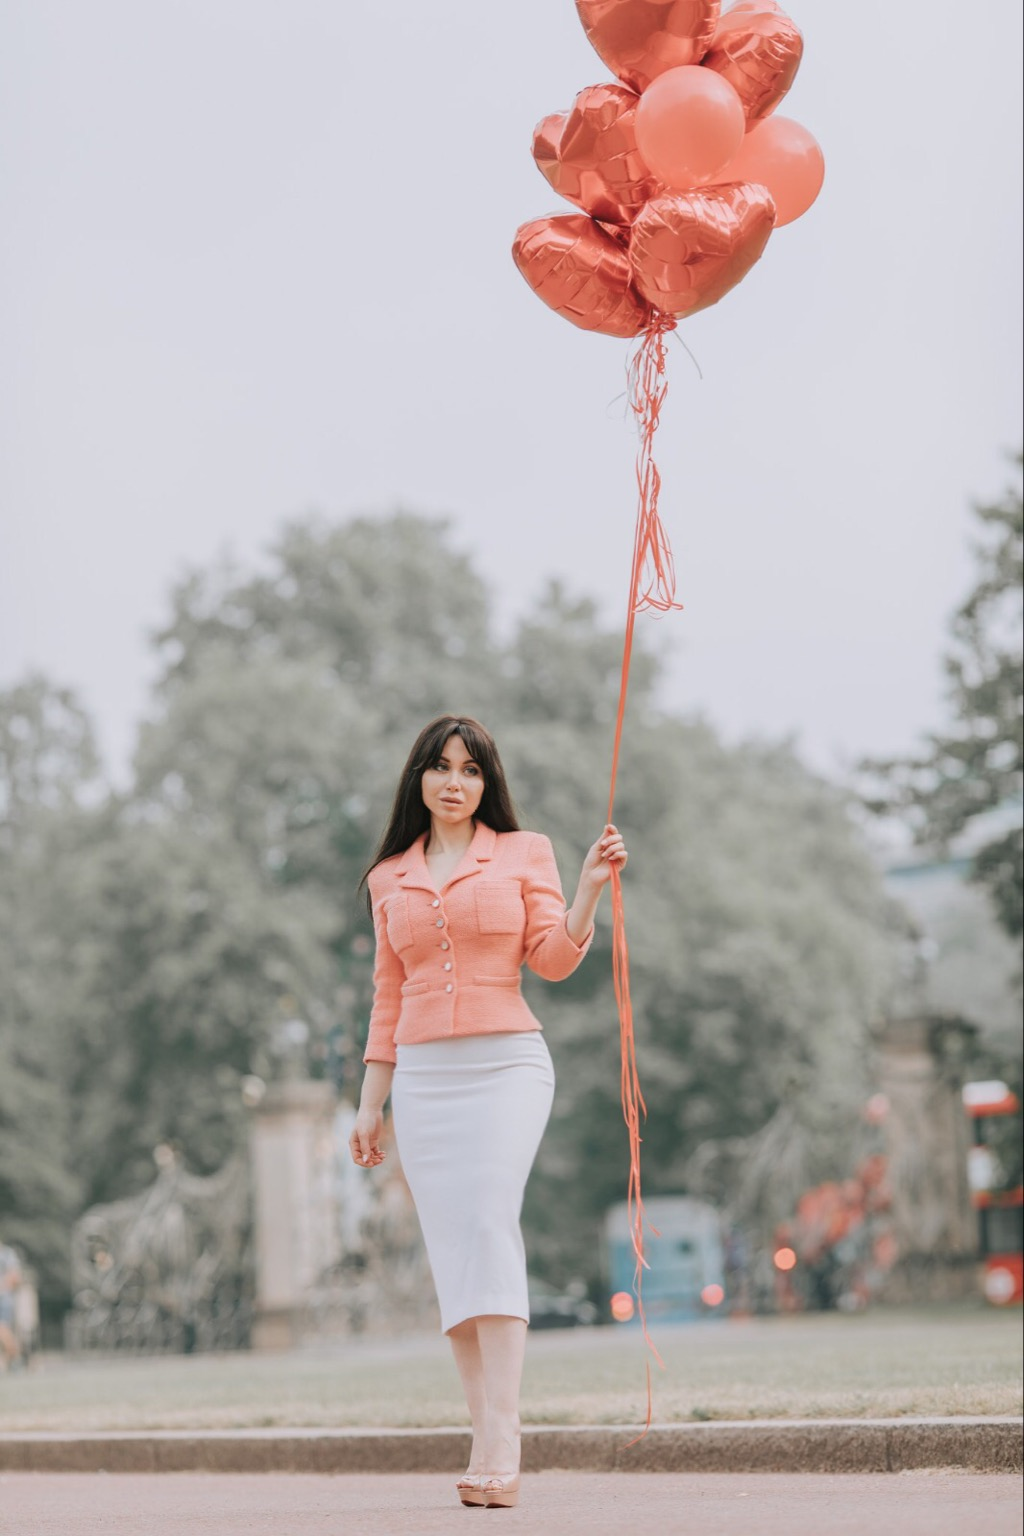 Mind Why Women Feel Jealous Hyde Park London Guide Louboutin Lady Peep Nude Chanel Suit Chanel Fashion Balloons Photoshoot Roland Mouret Arreton Skirt London Fashion Blogger Ladynatalina bark post Signs Of Jealousy